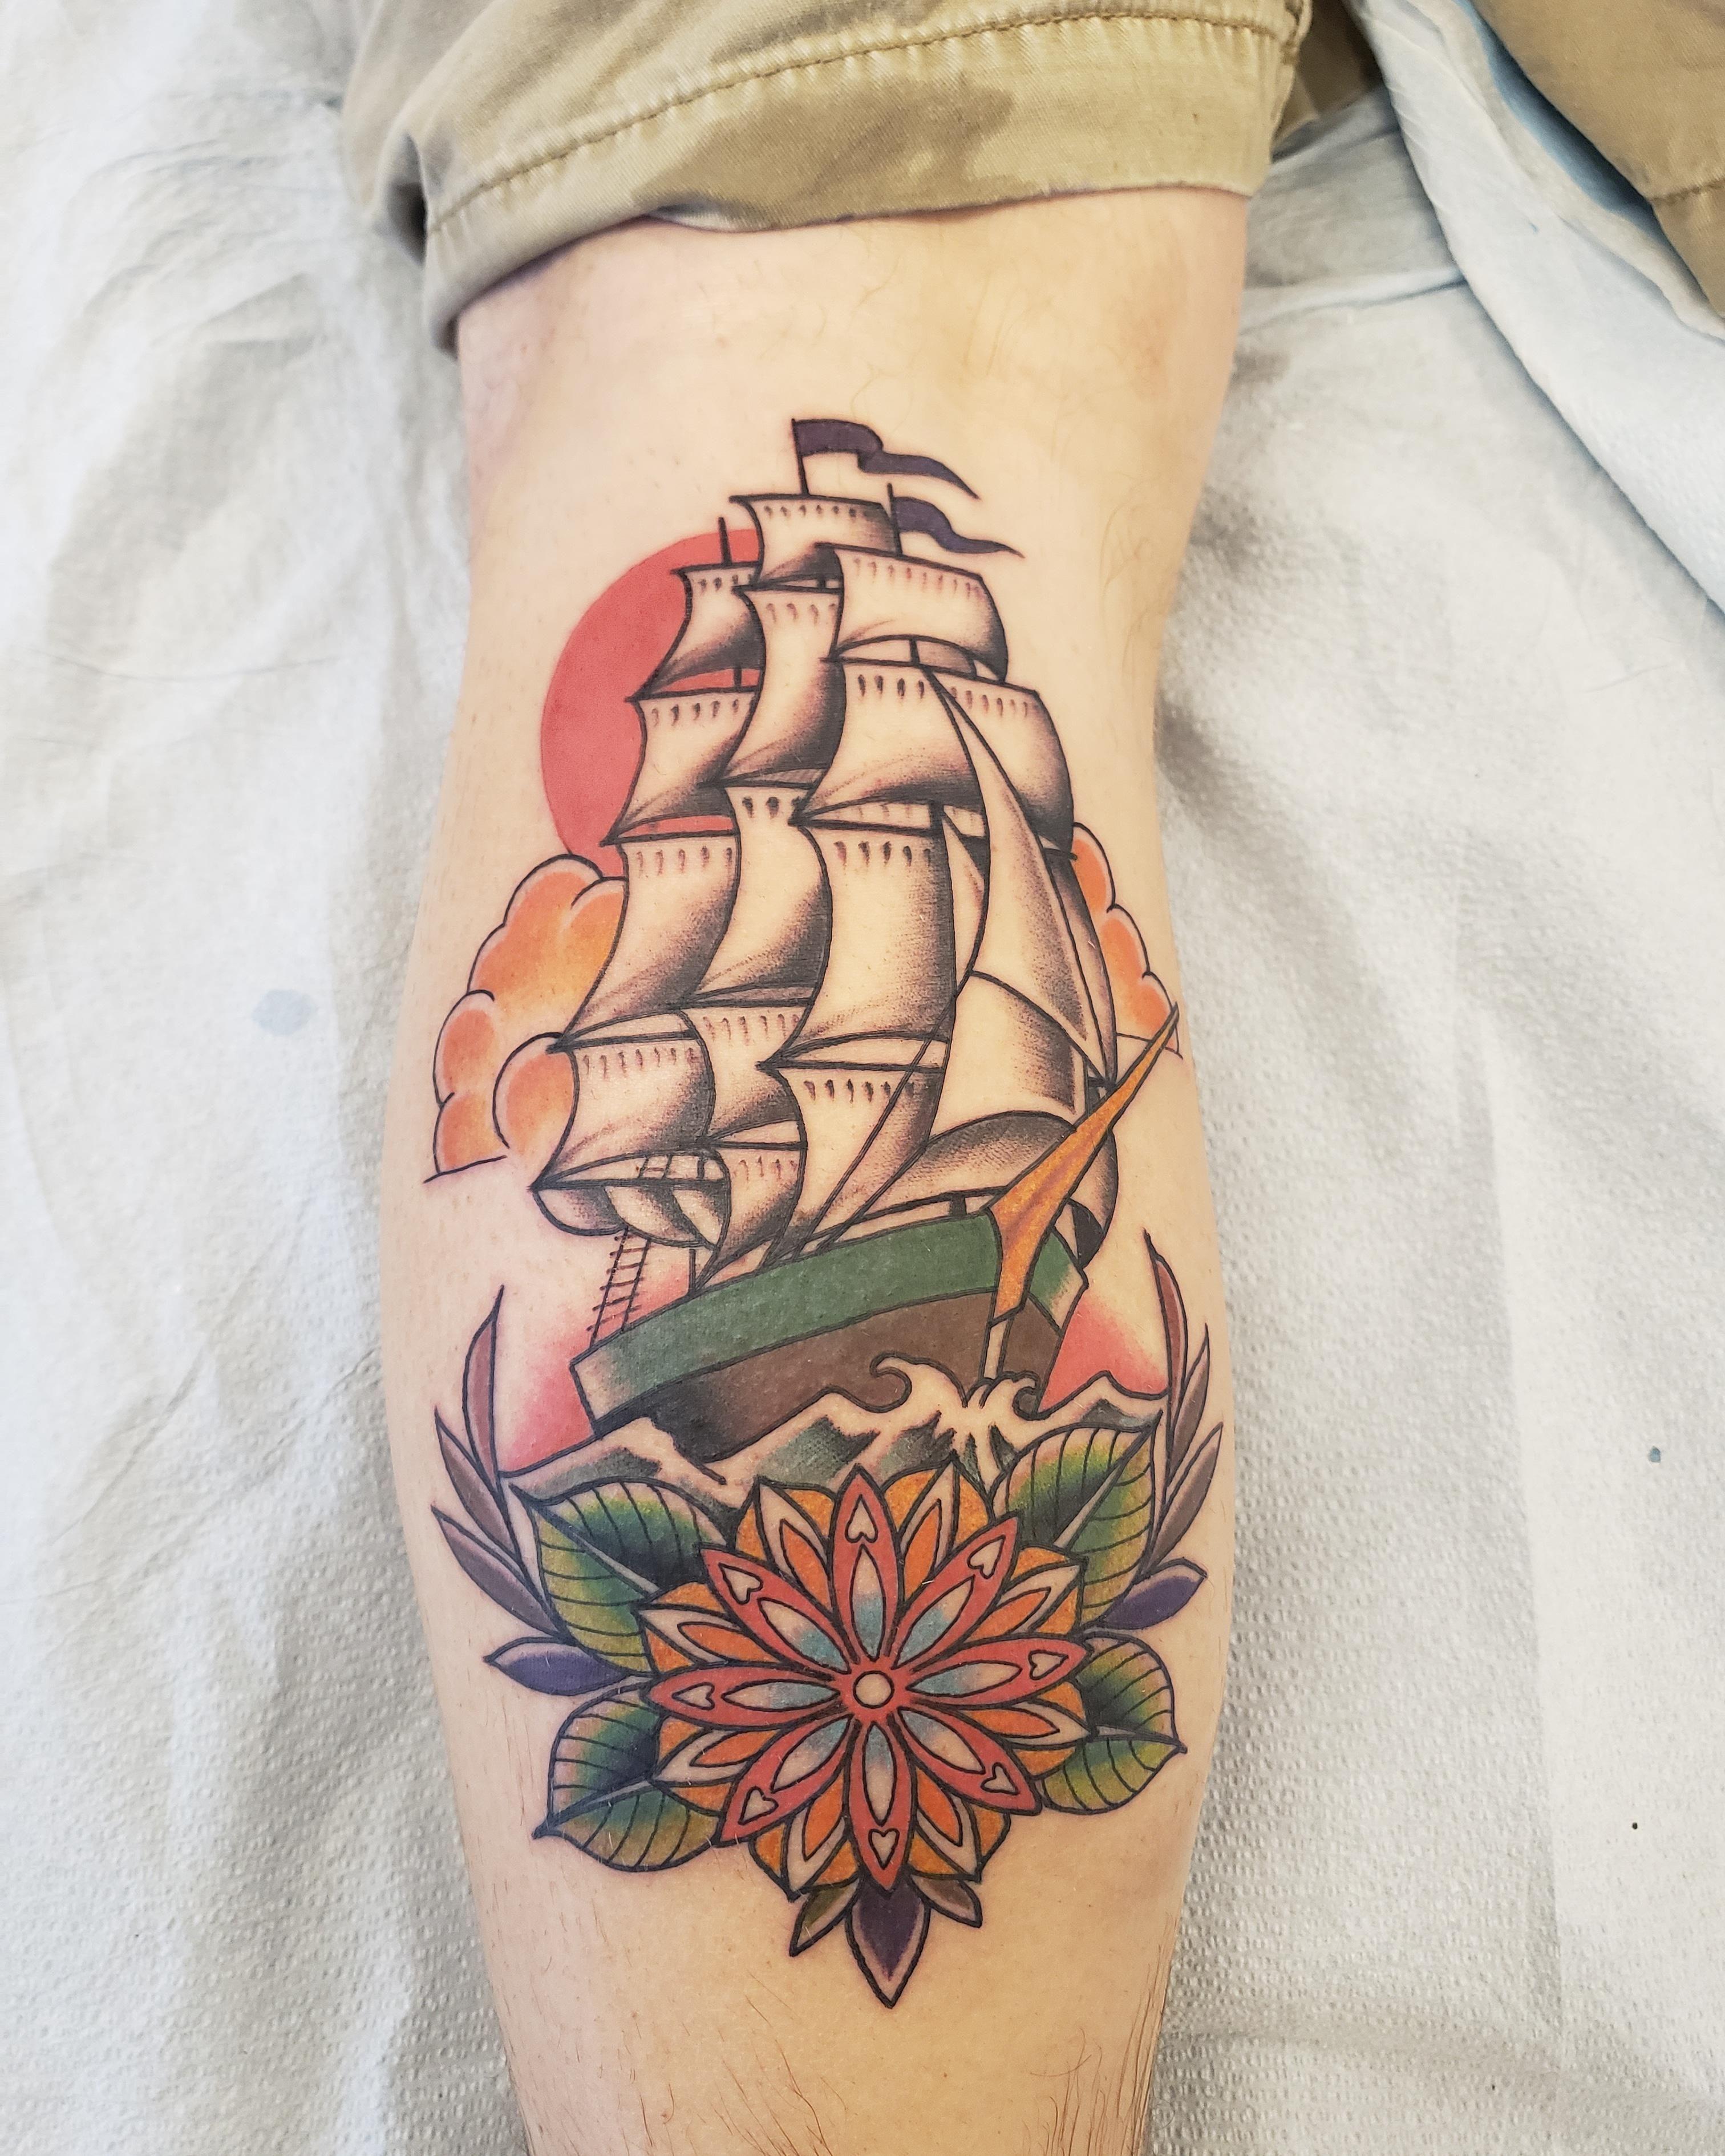 First tattoo artist english cousins location nashville